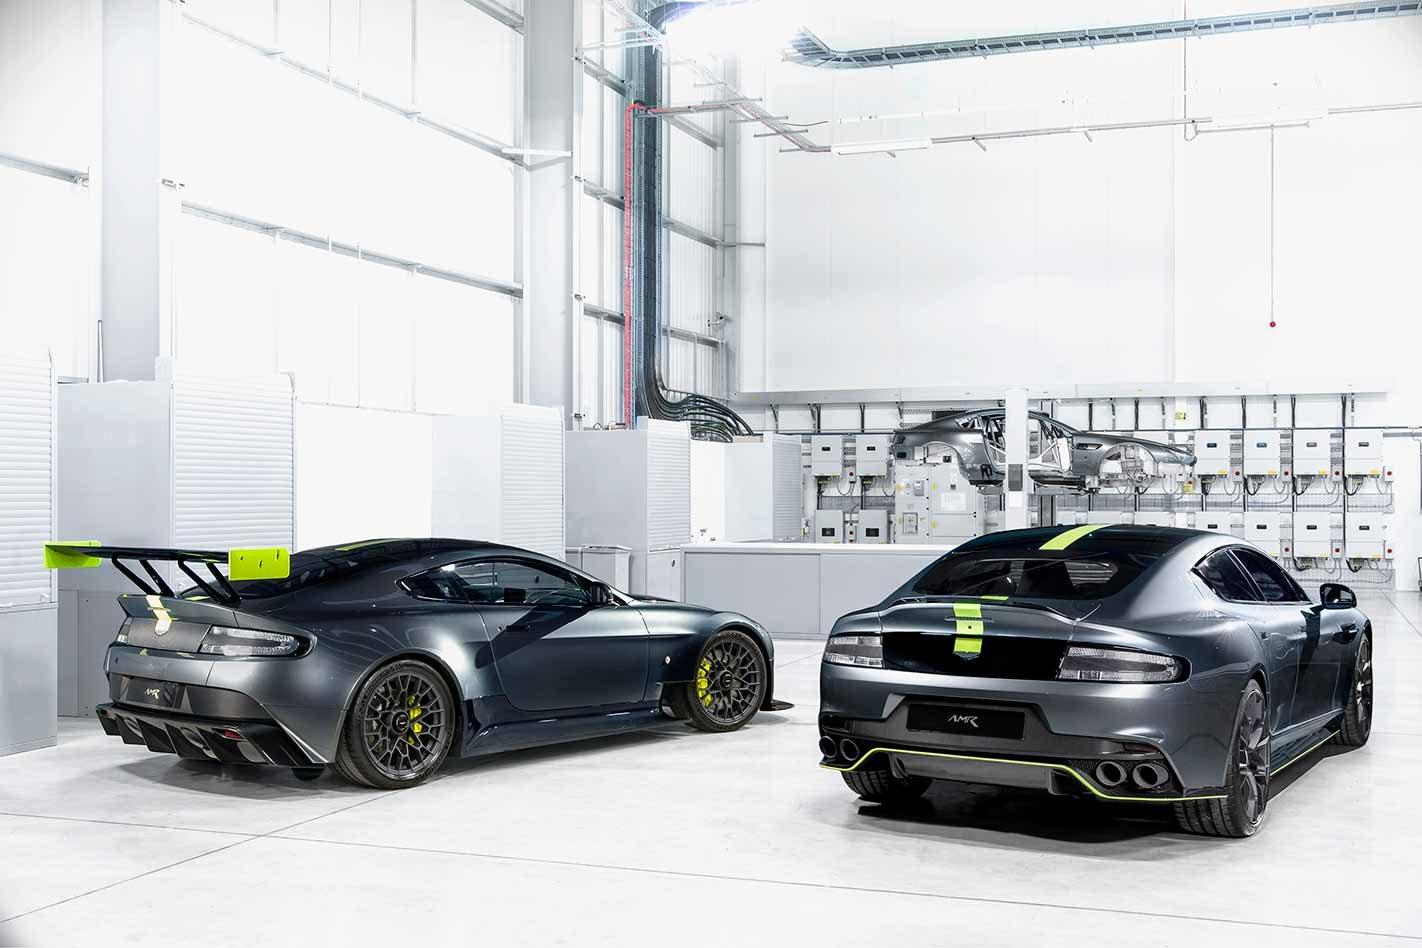 Aston Martin AMR rear